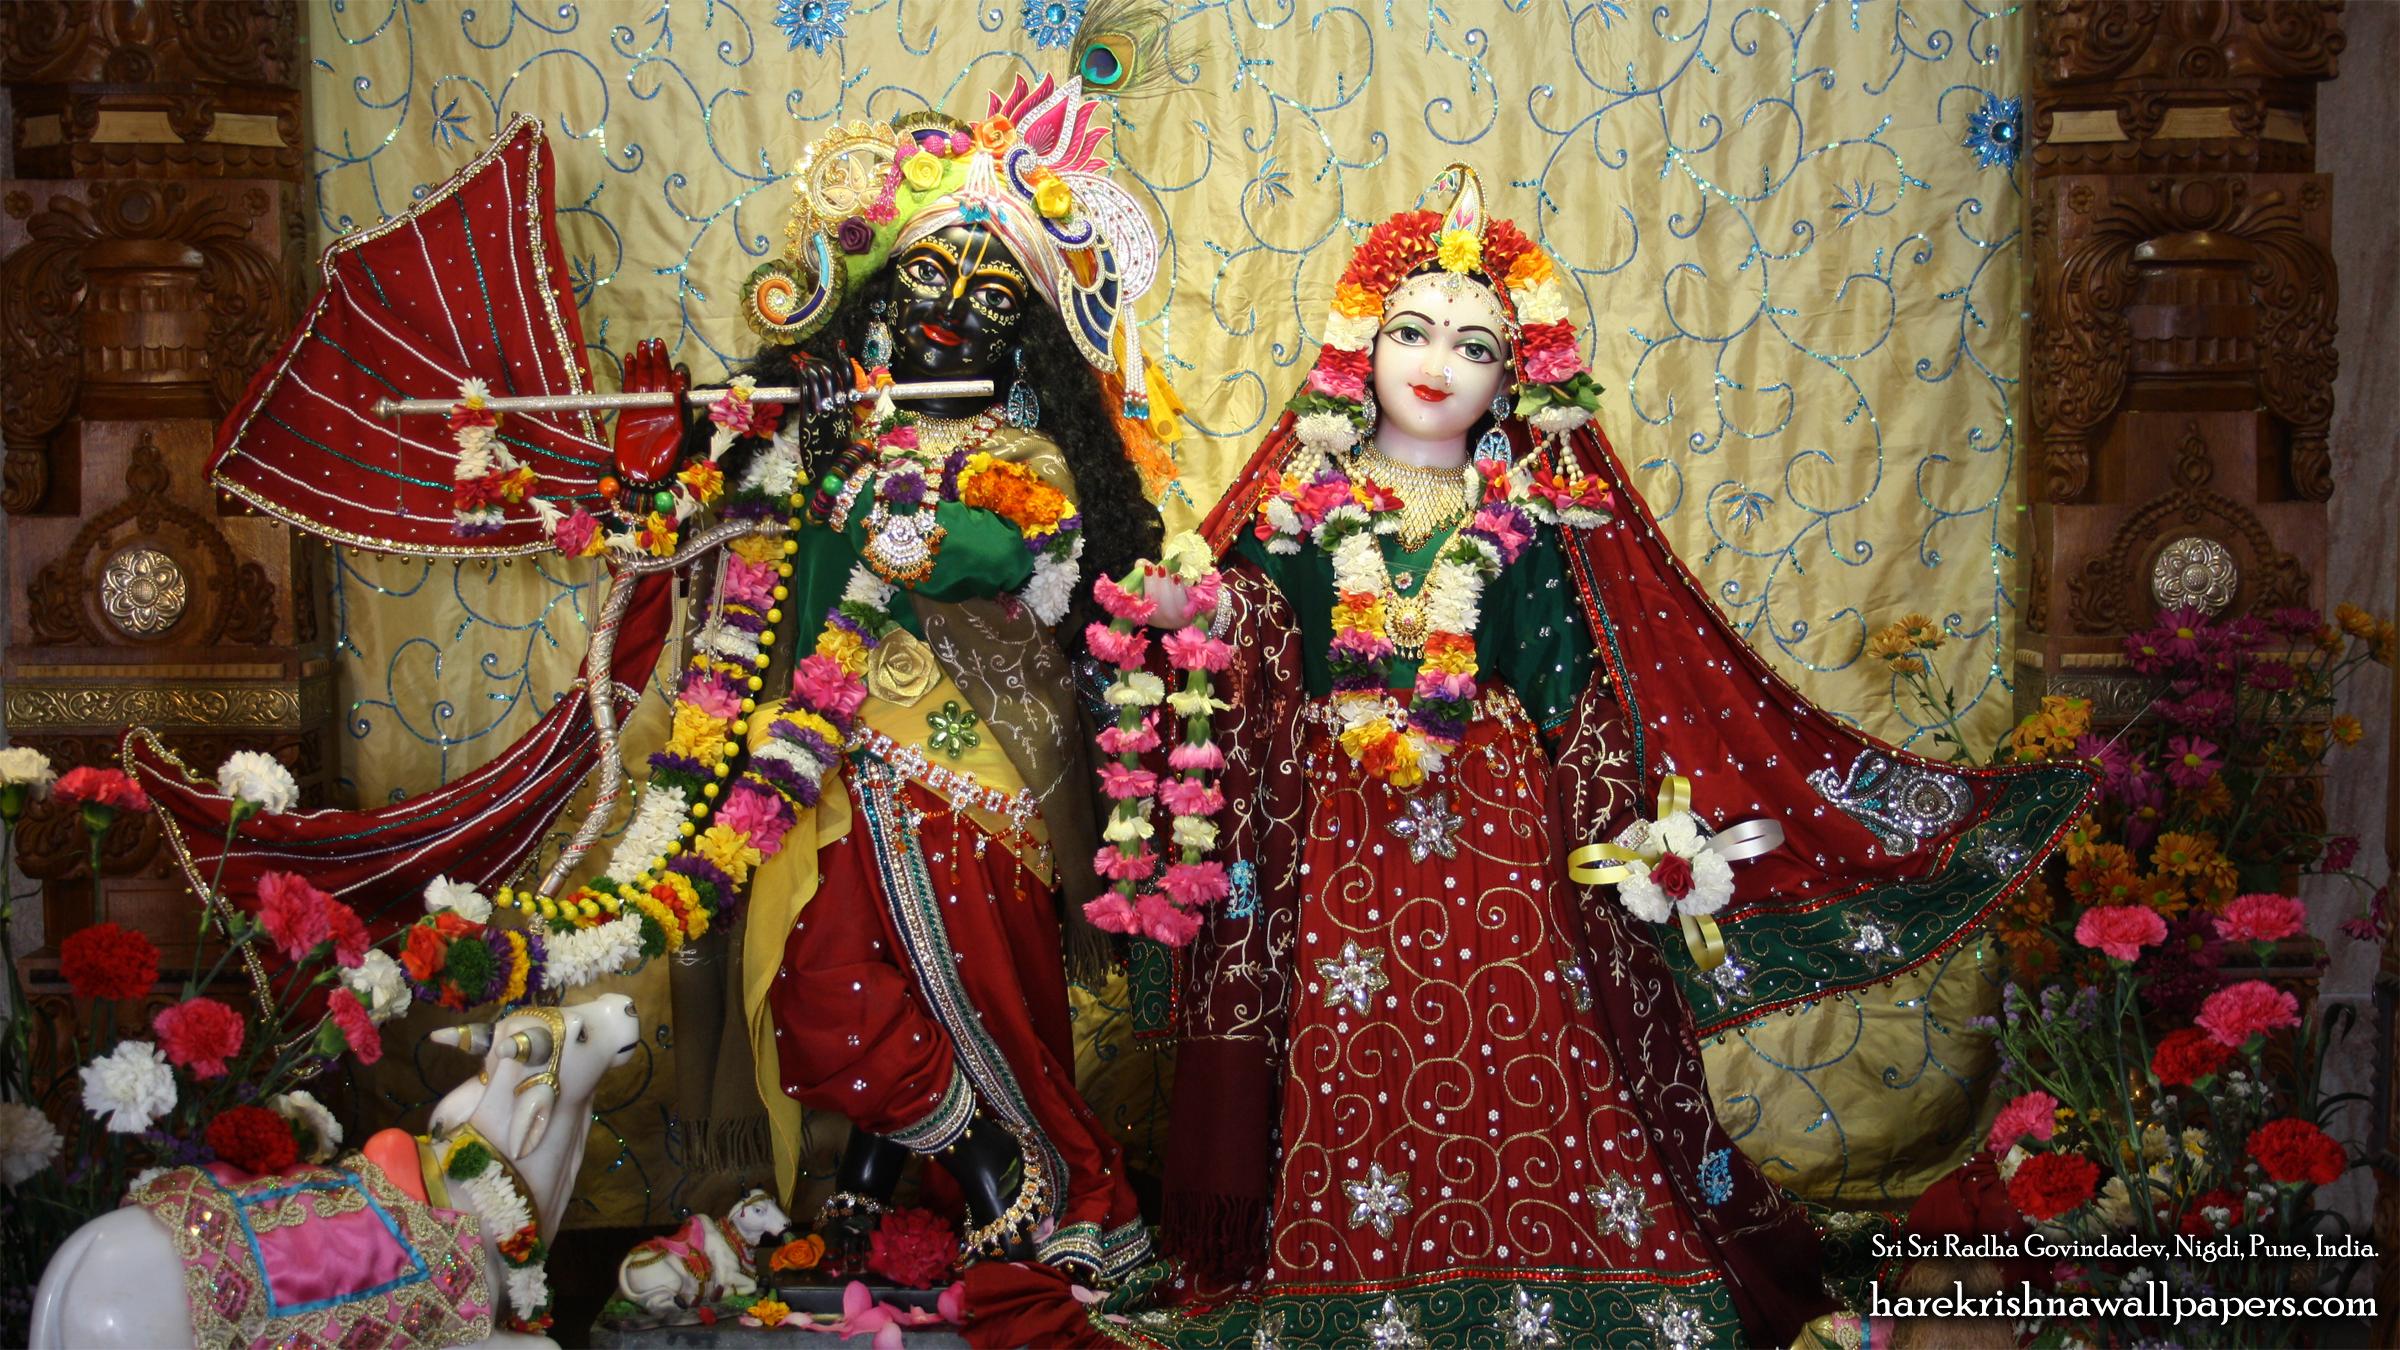 Sri Sri Radha Govind Wallpaper (031) Size 2400x1350 Download